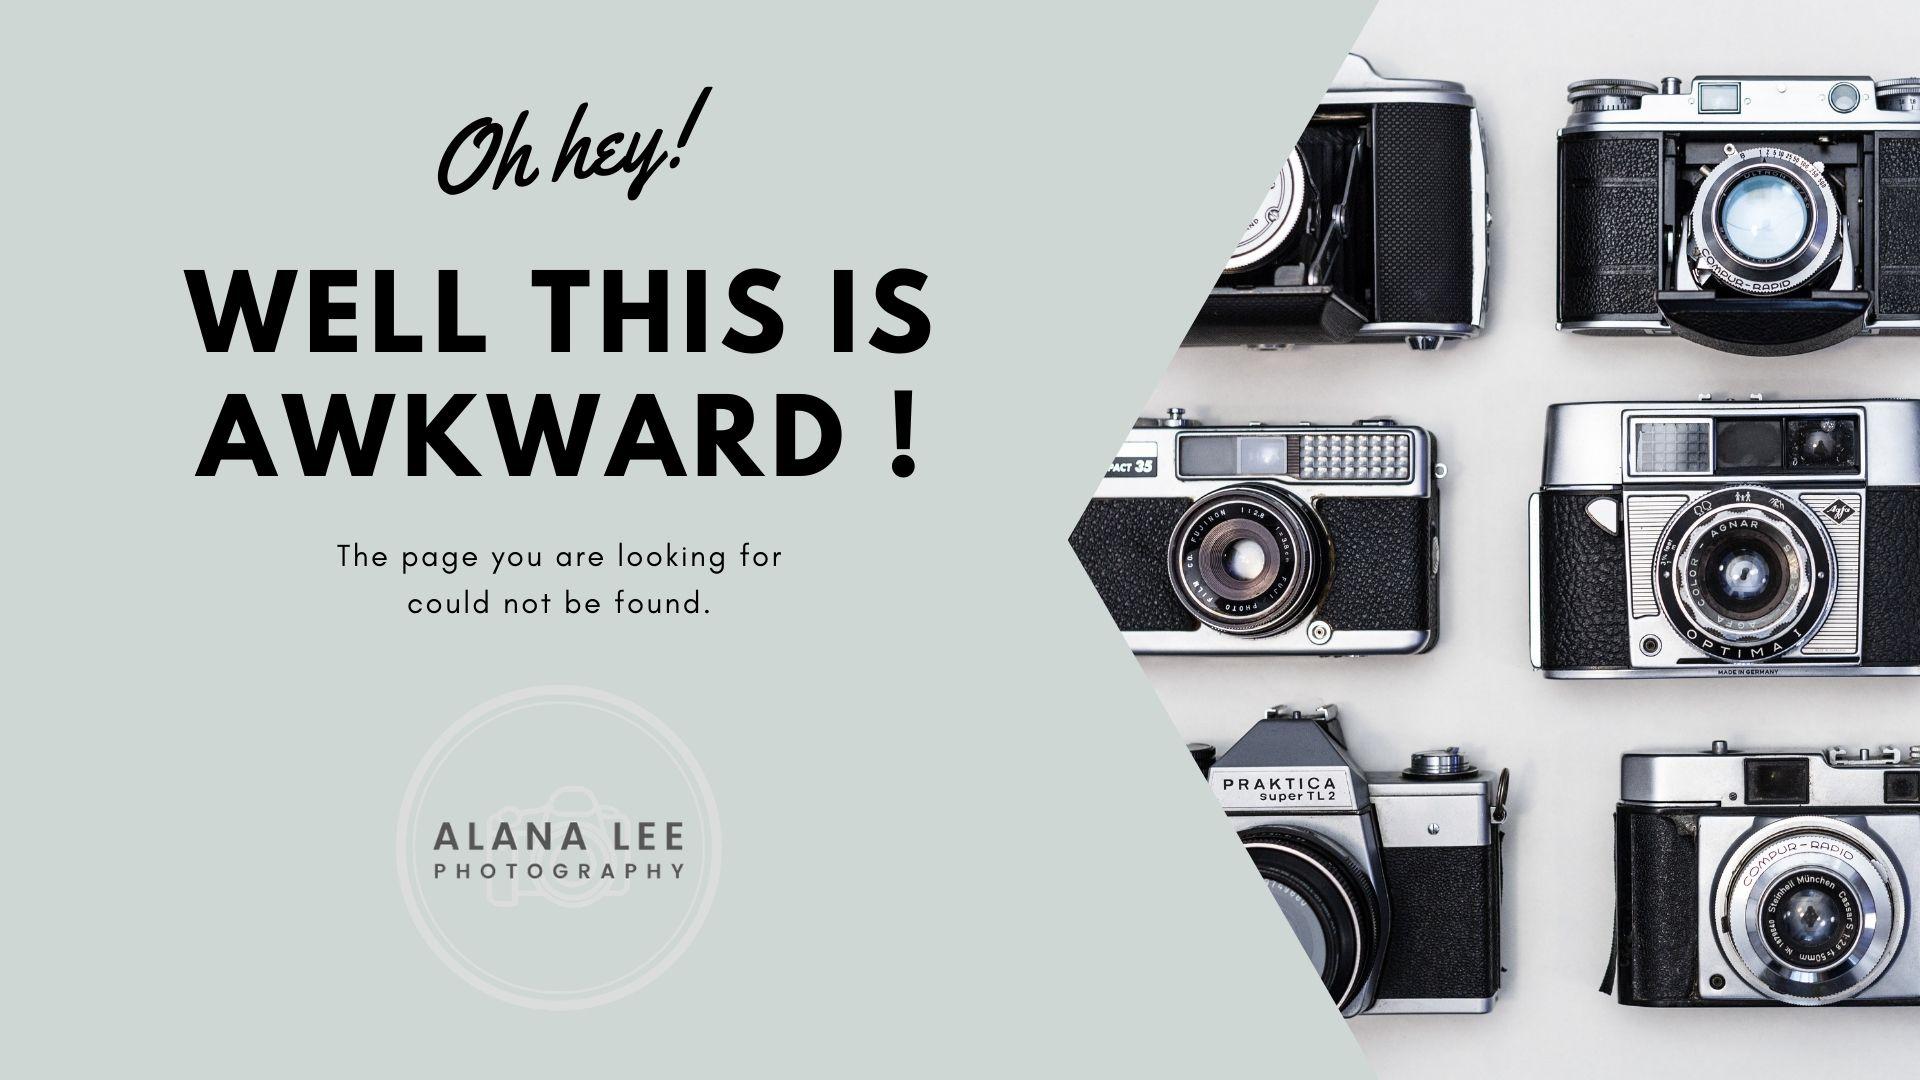 alana lee custom 404 error page